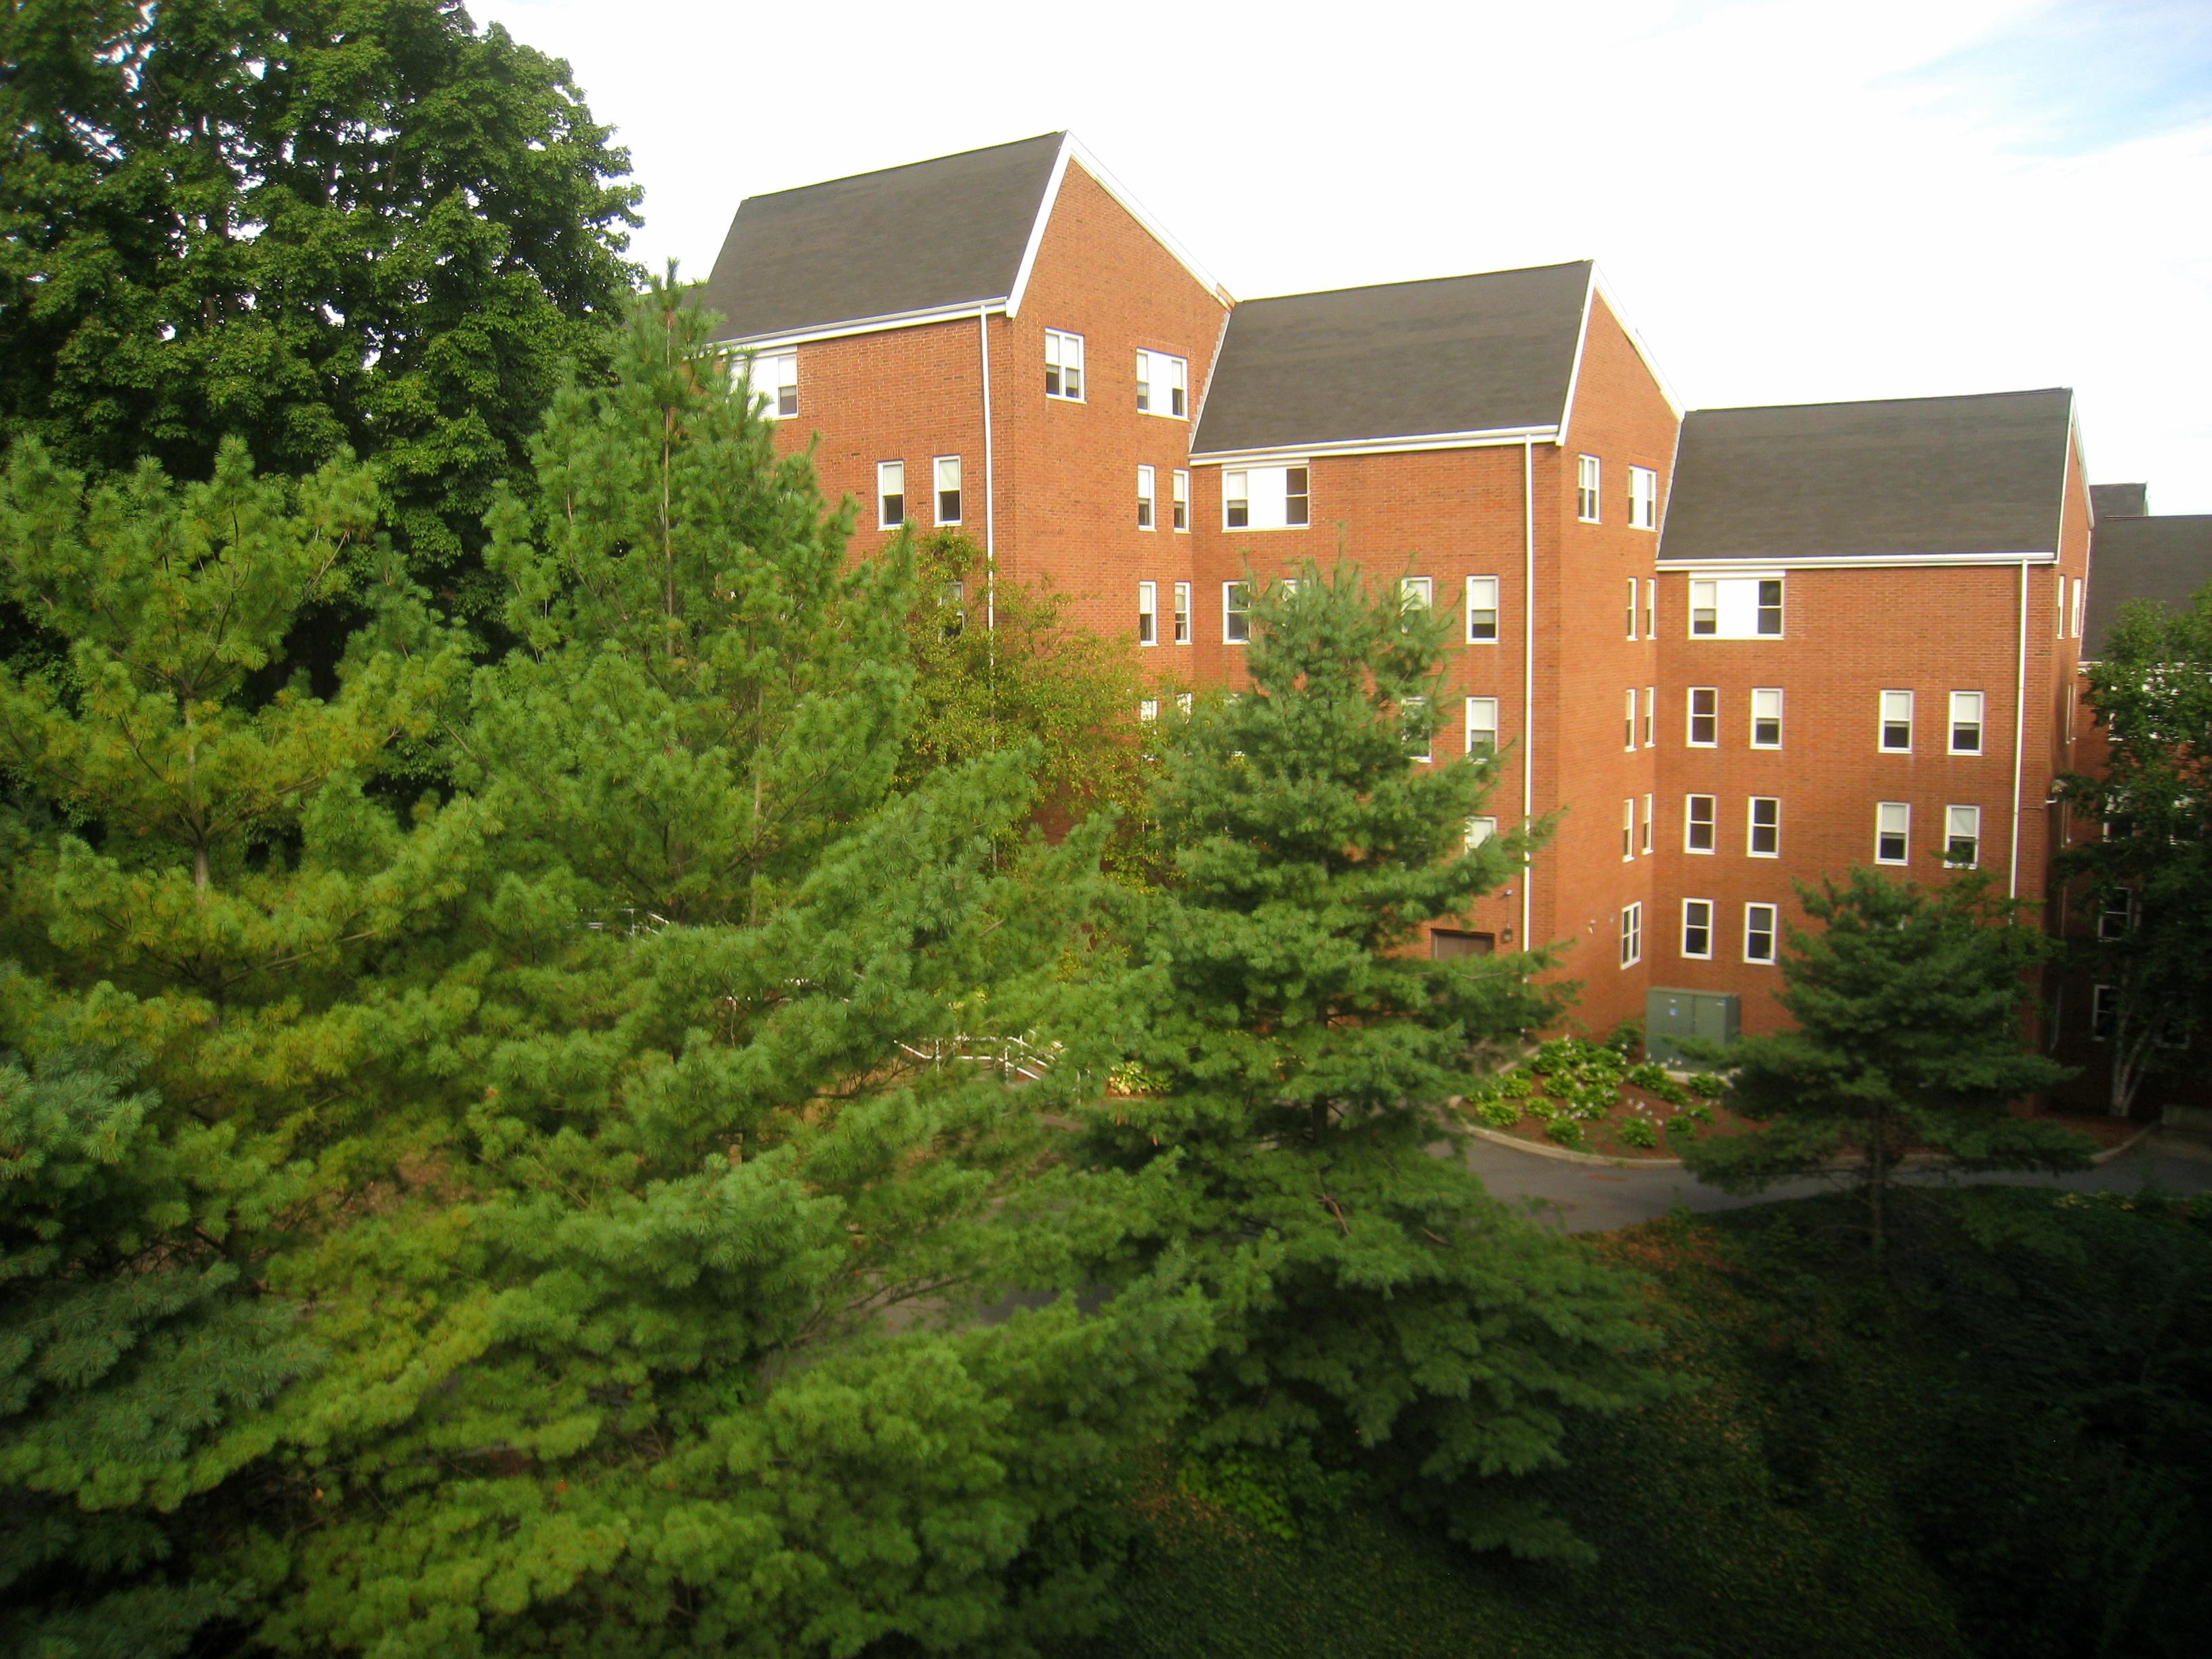 Description dorms tufts university img 0970 jpg